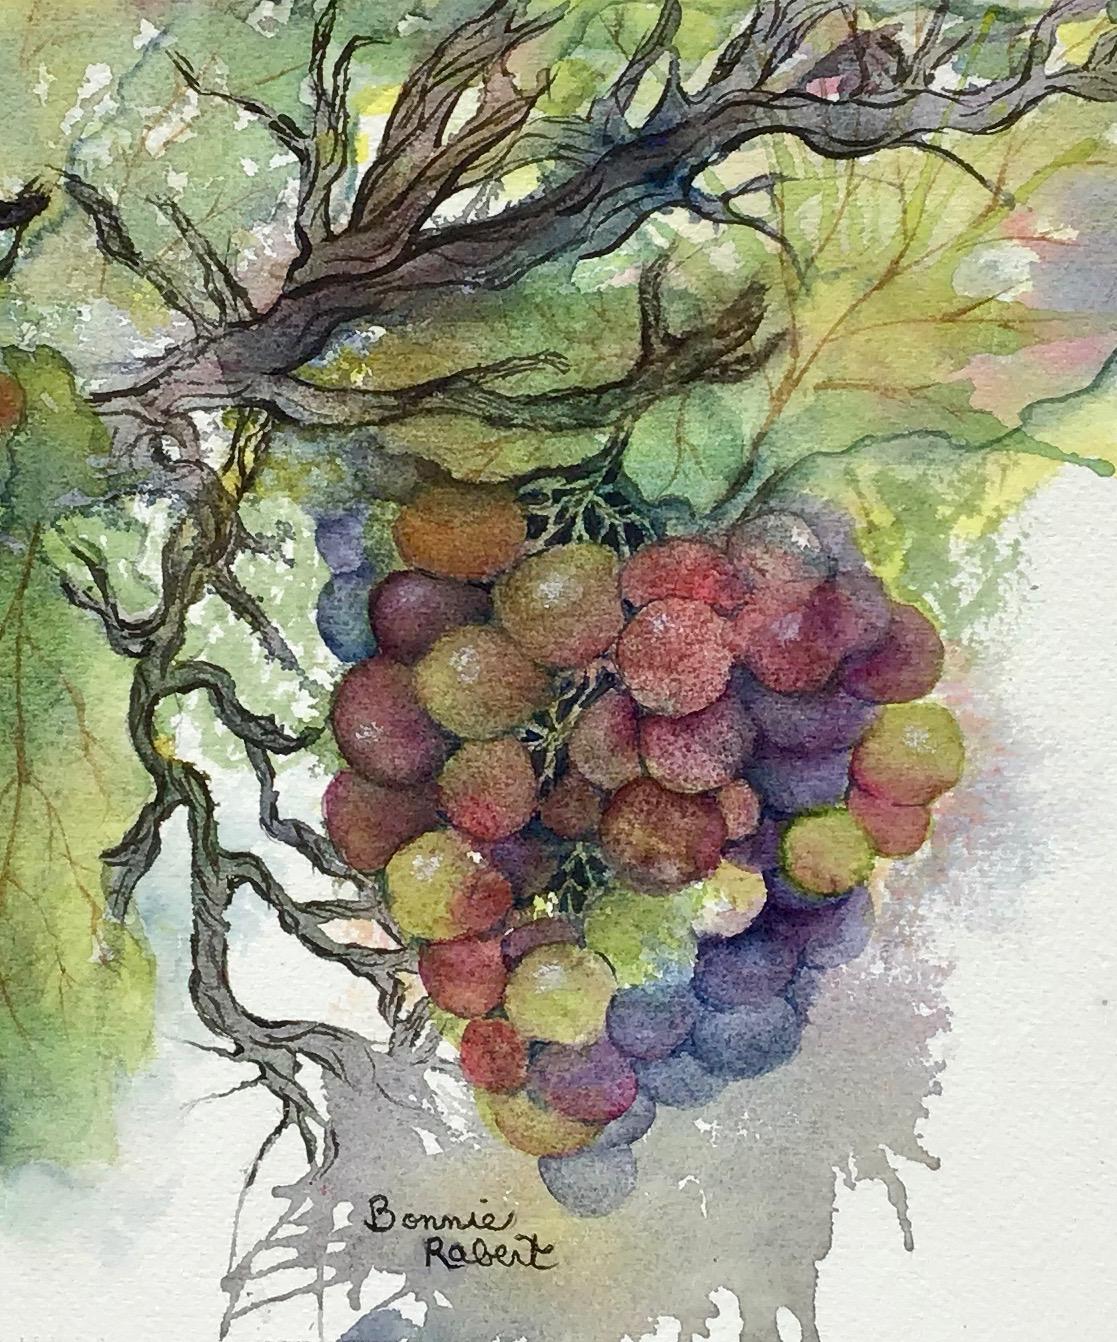 Grapes on the Vine, Original Watercolor